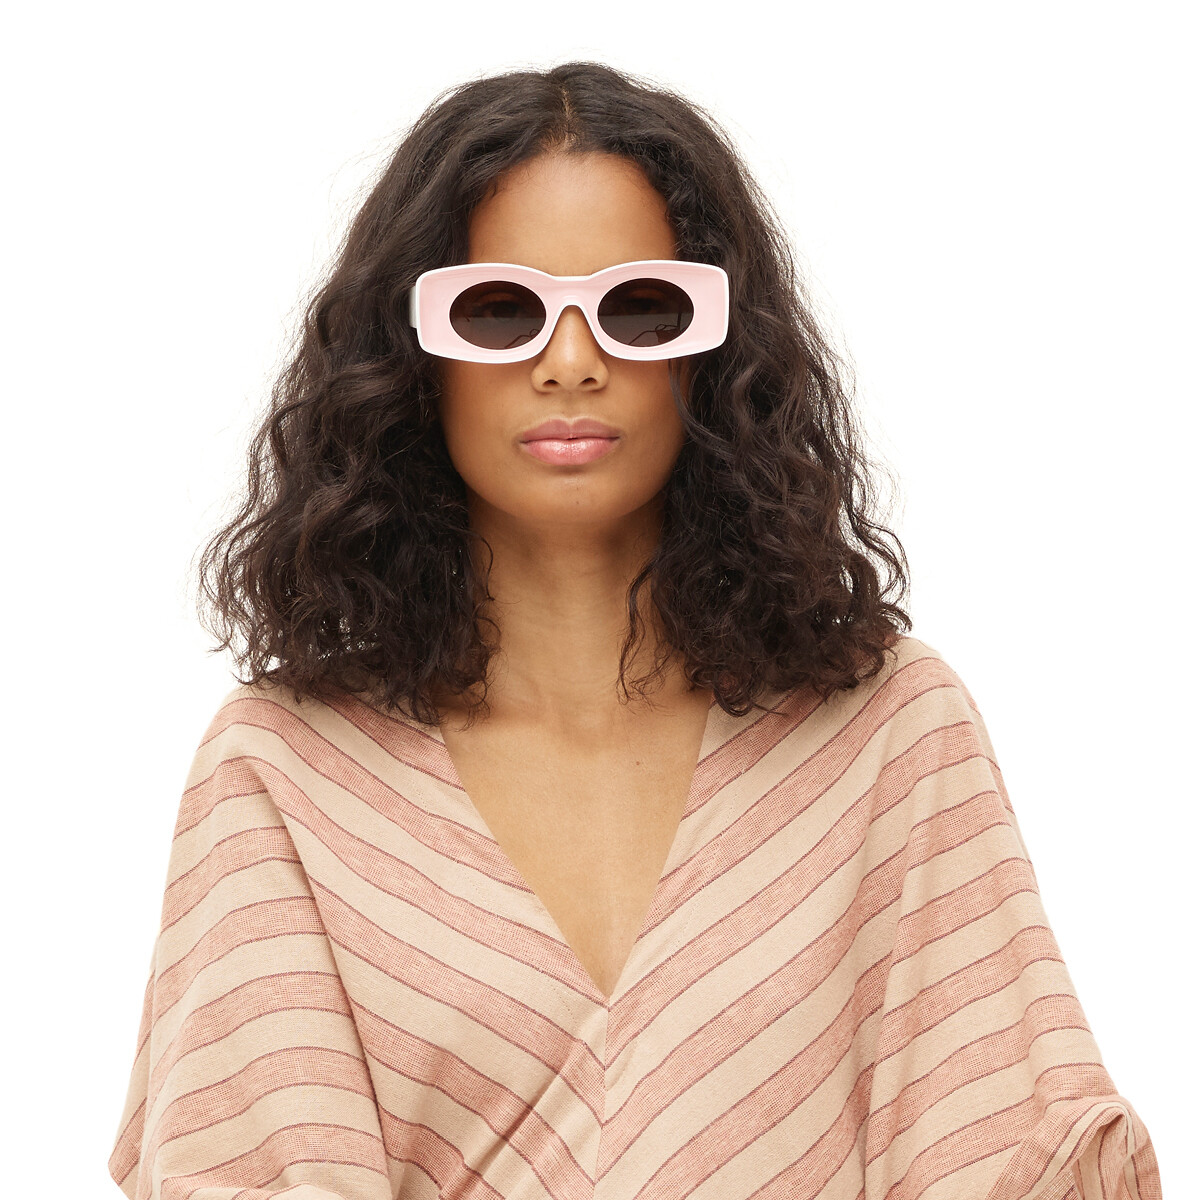 LOEWE Paula's Ibiza Original Sunglasses In Acetate Pink/White front